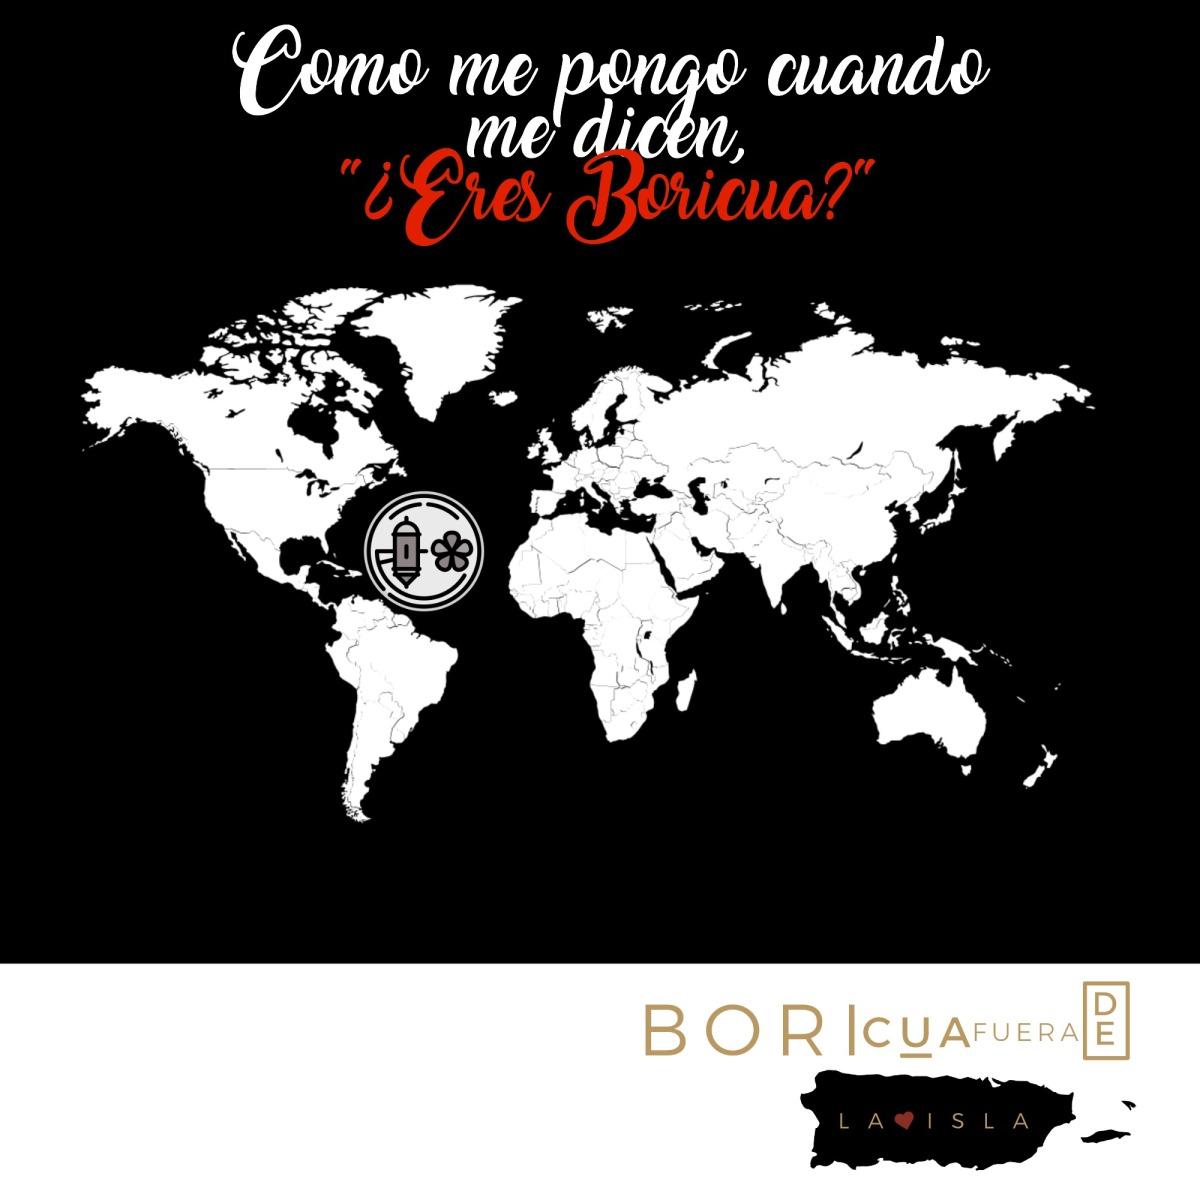 Boricua2.jpg